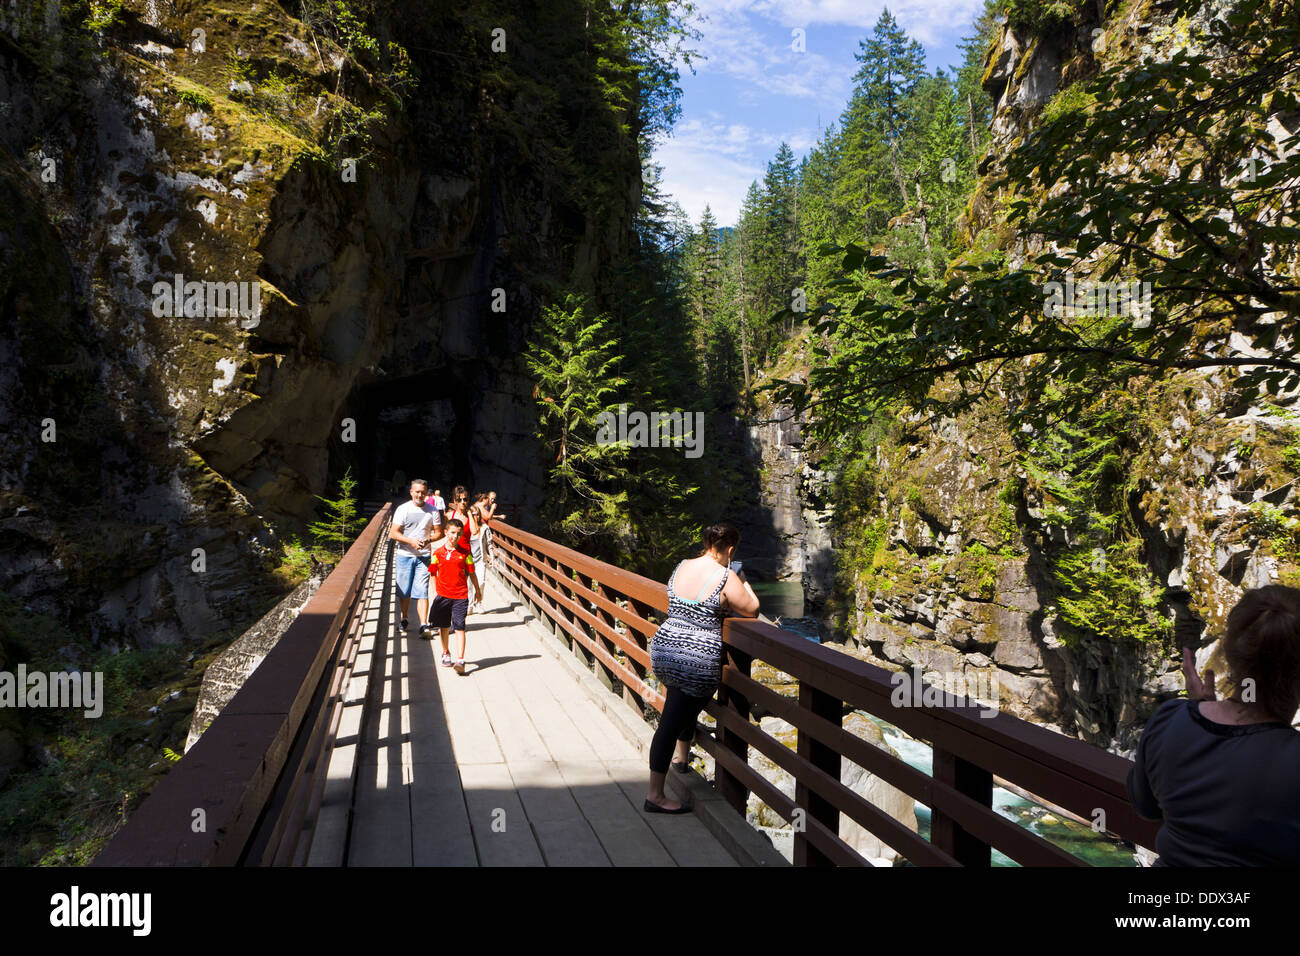 Coquihalla Canyon Provincial Park, Esperanza, British Columbia, Canadá. Foto de stock